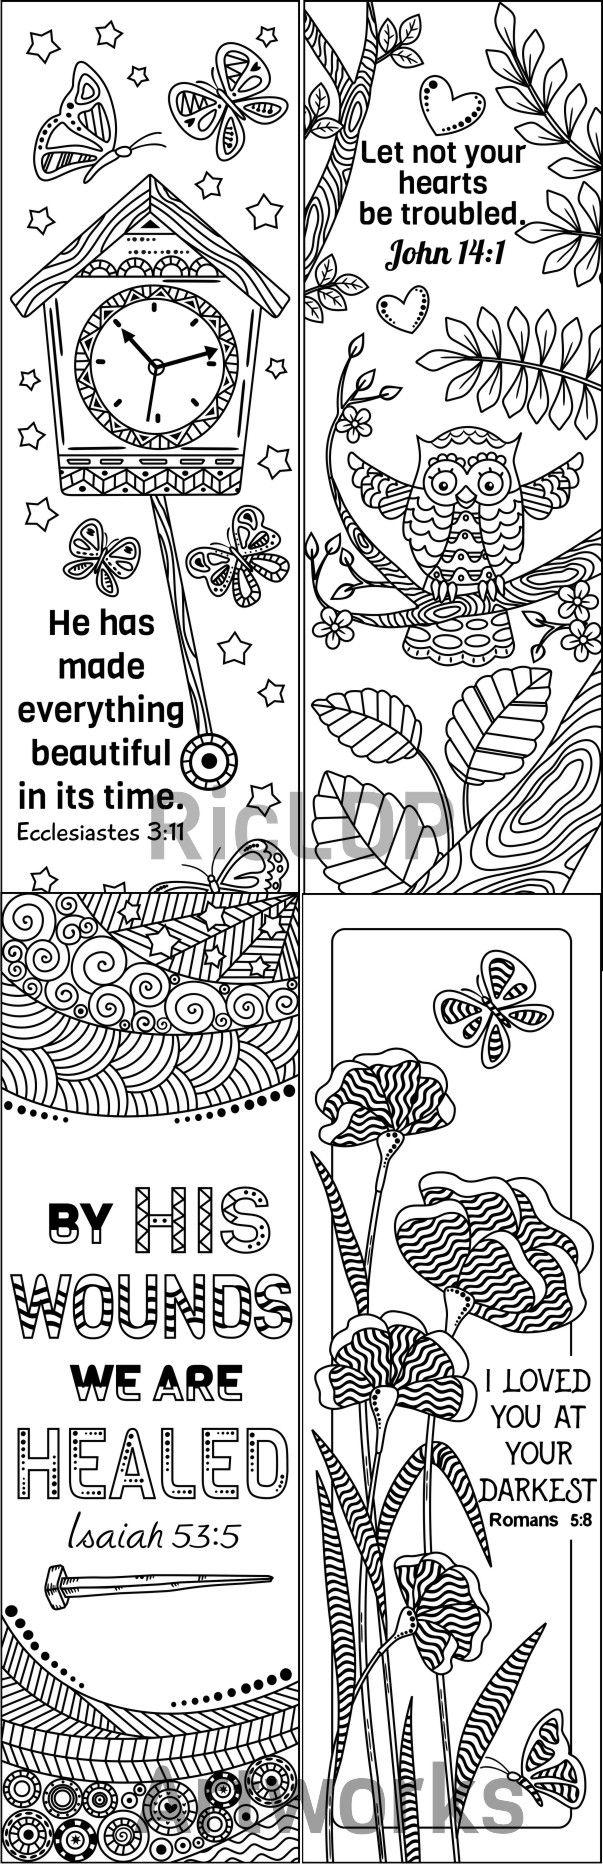 Coloring pages bible - 8 Printable Bible Verse Coloring Bookmarks Coloring Doodle Bookmarks With Inspiring Bible Verses